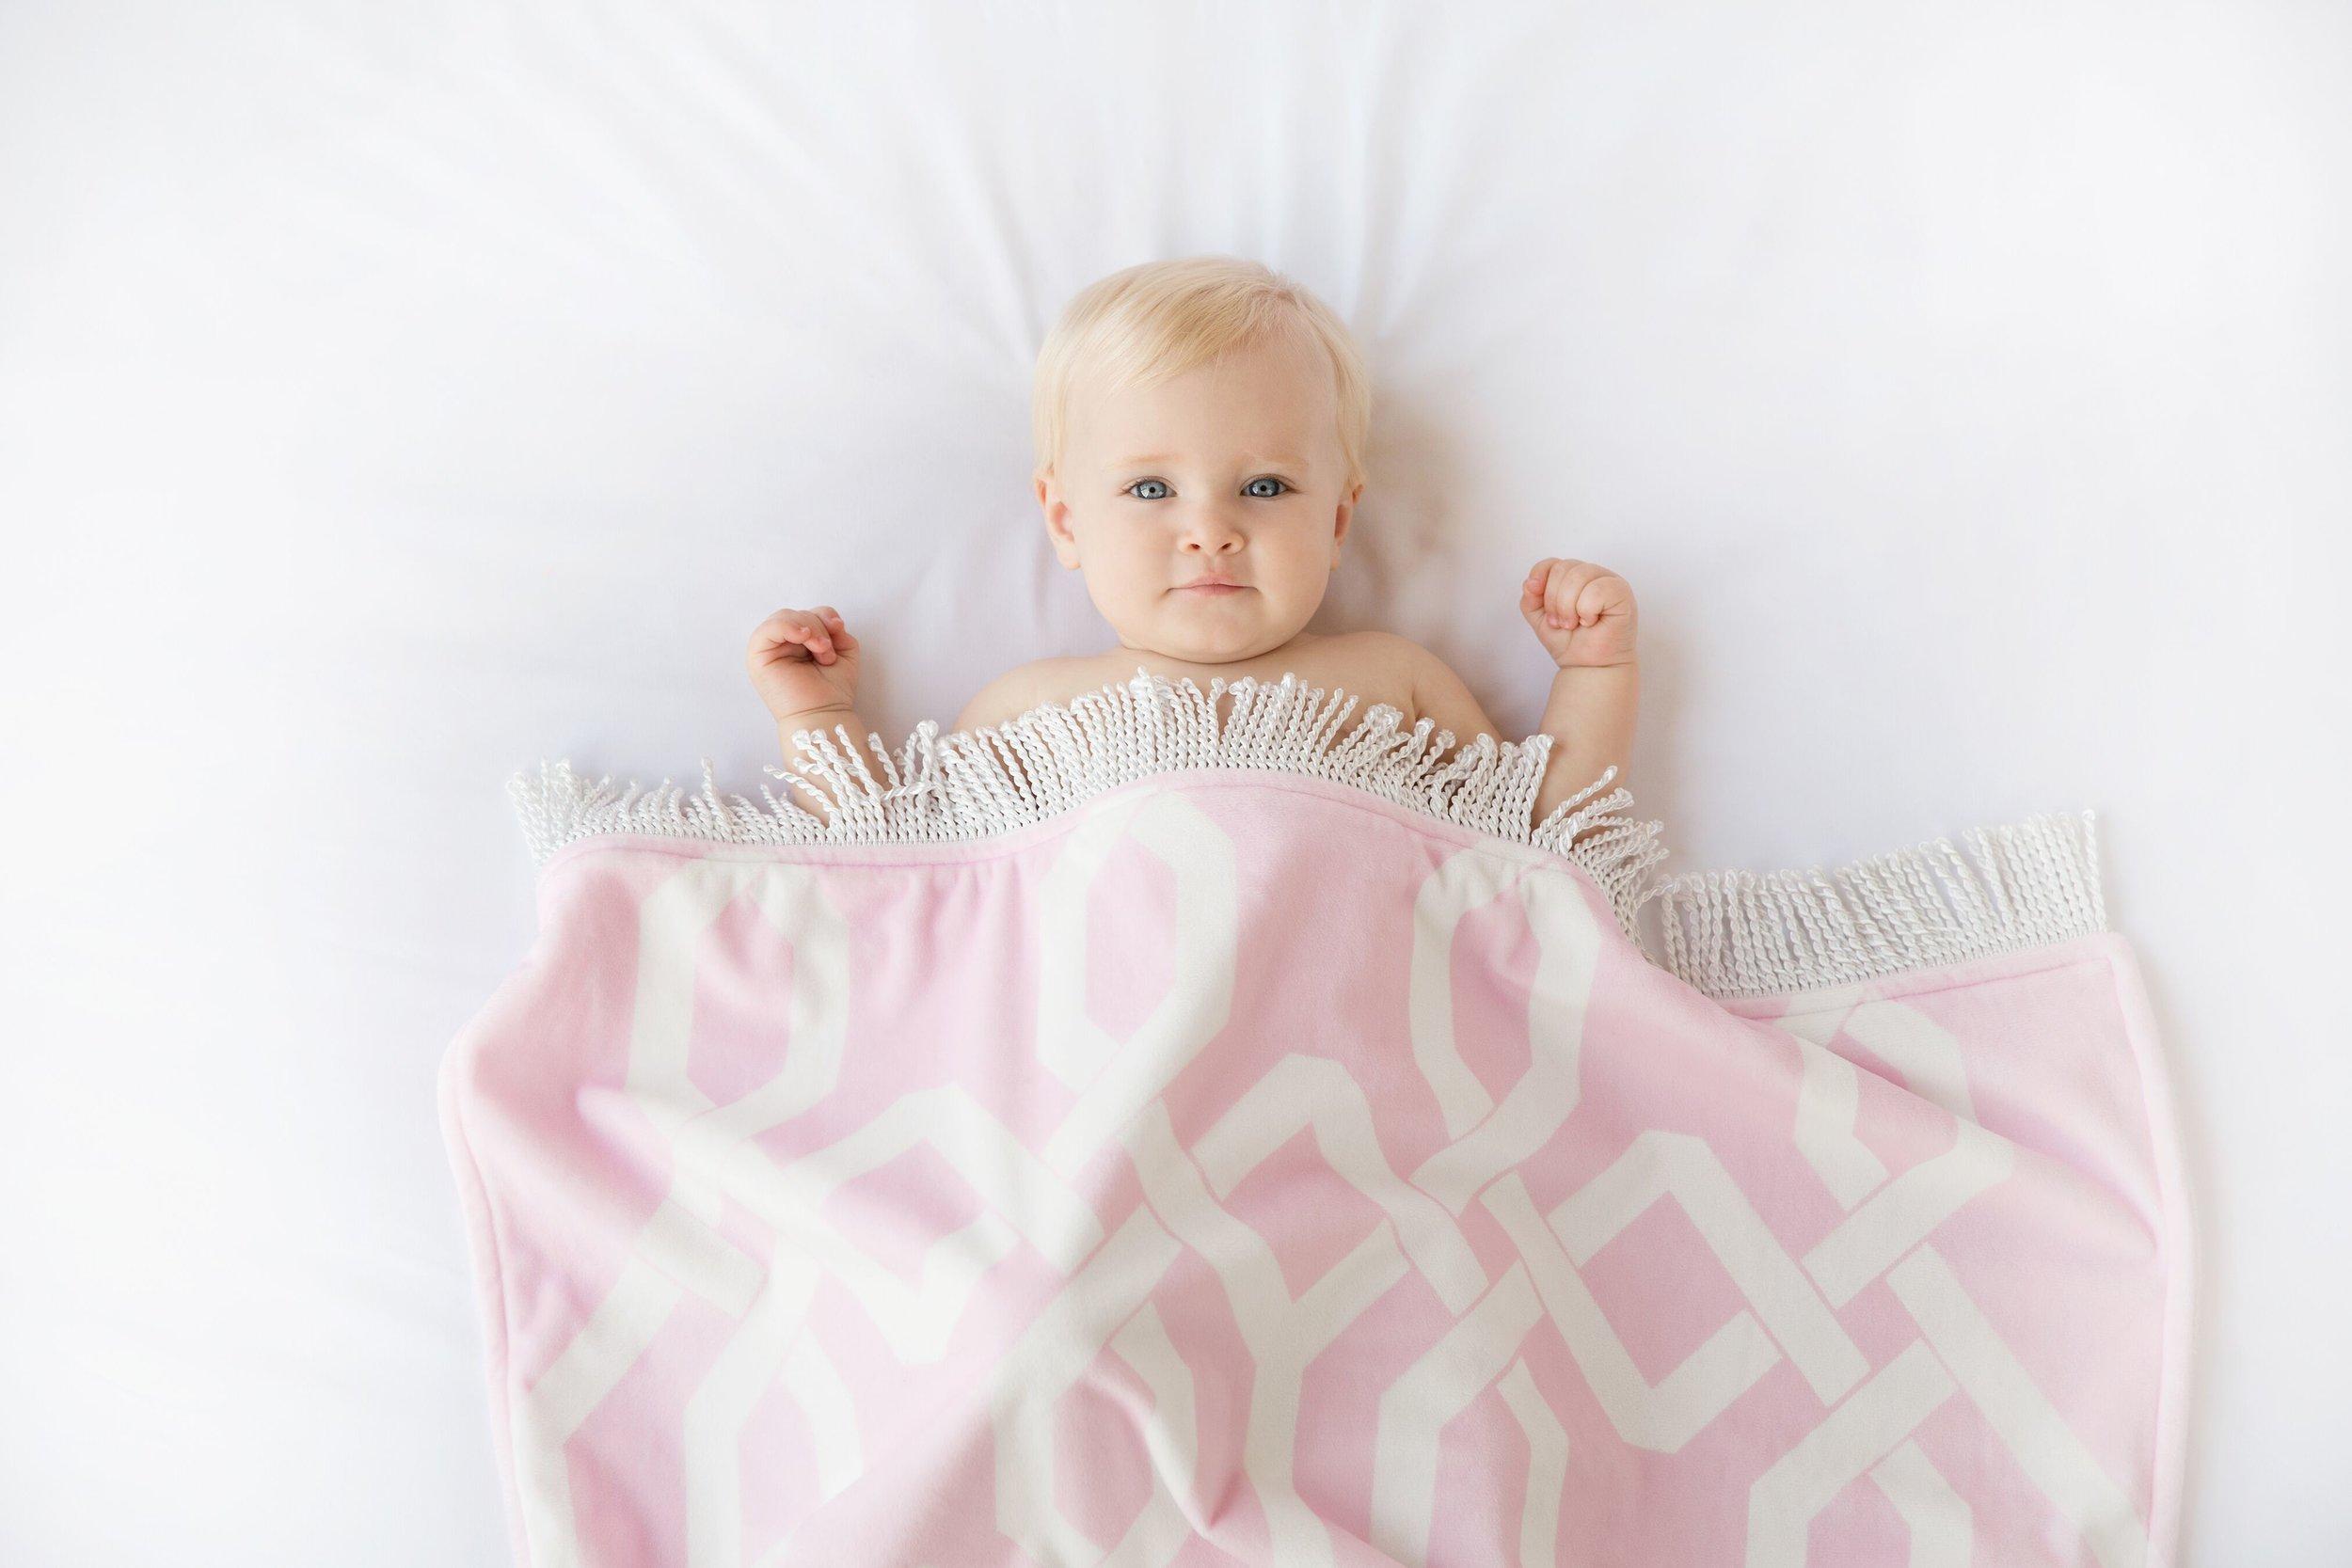 baby blankets-receiving blankets-softest baby blankets-best price baby blankets-piper jade kids clothing-Costa Mesa-California-92627-best online children's clothing storeg